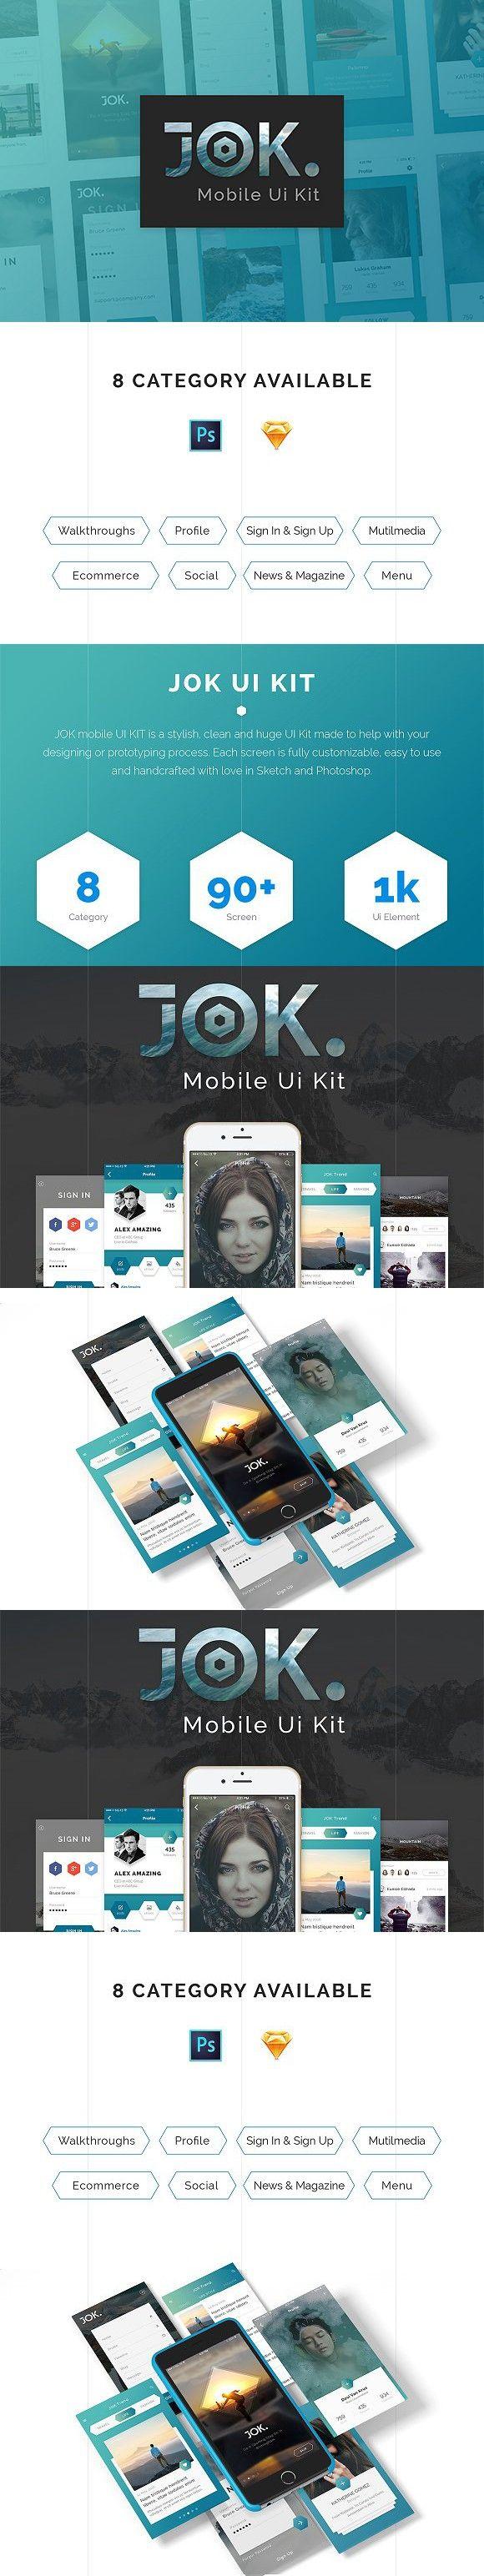 JOK Mobile App UI KIT. Website Templates